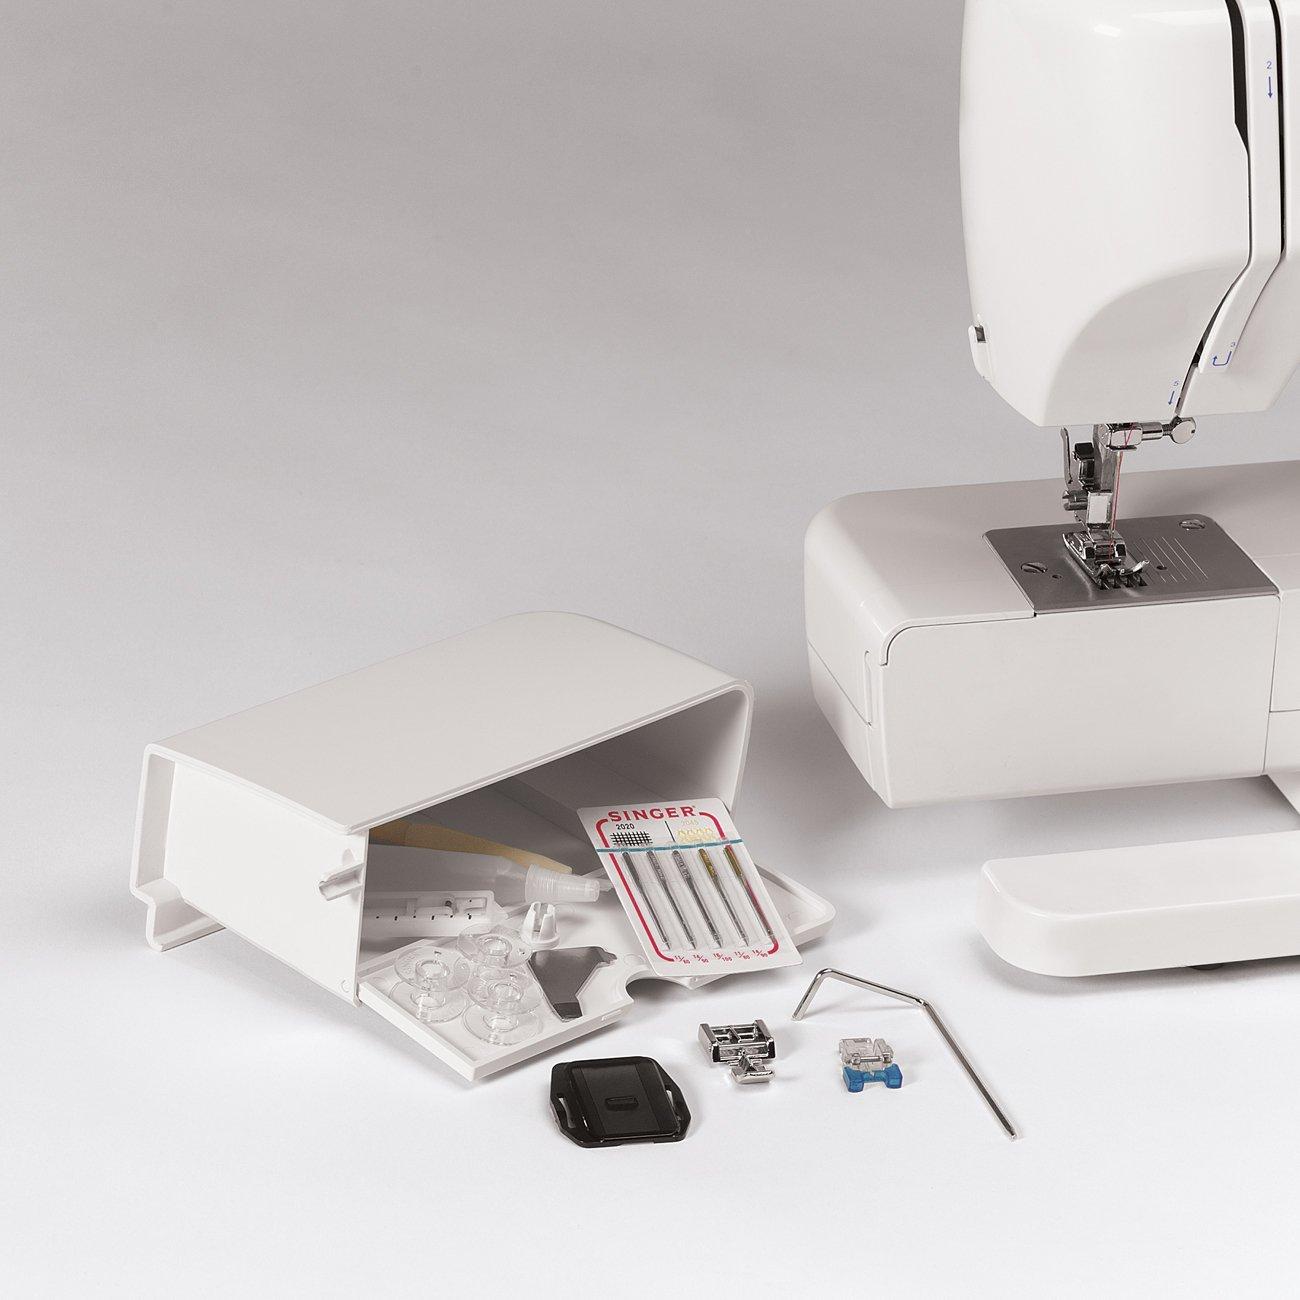 SINGER Tradition 2250 - Máquina de coser (Color blanco, Costura, Paso 4, Variable, Giratorio, Variable): Amazon.es: Hogar